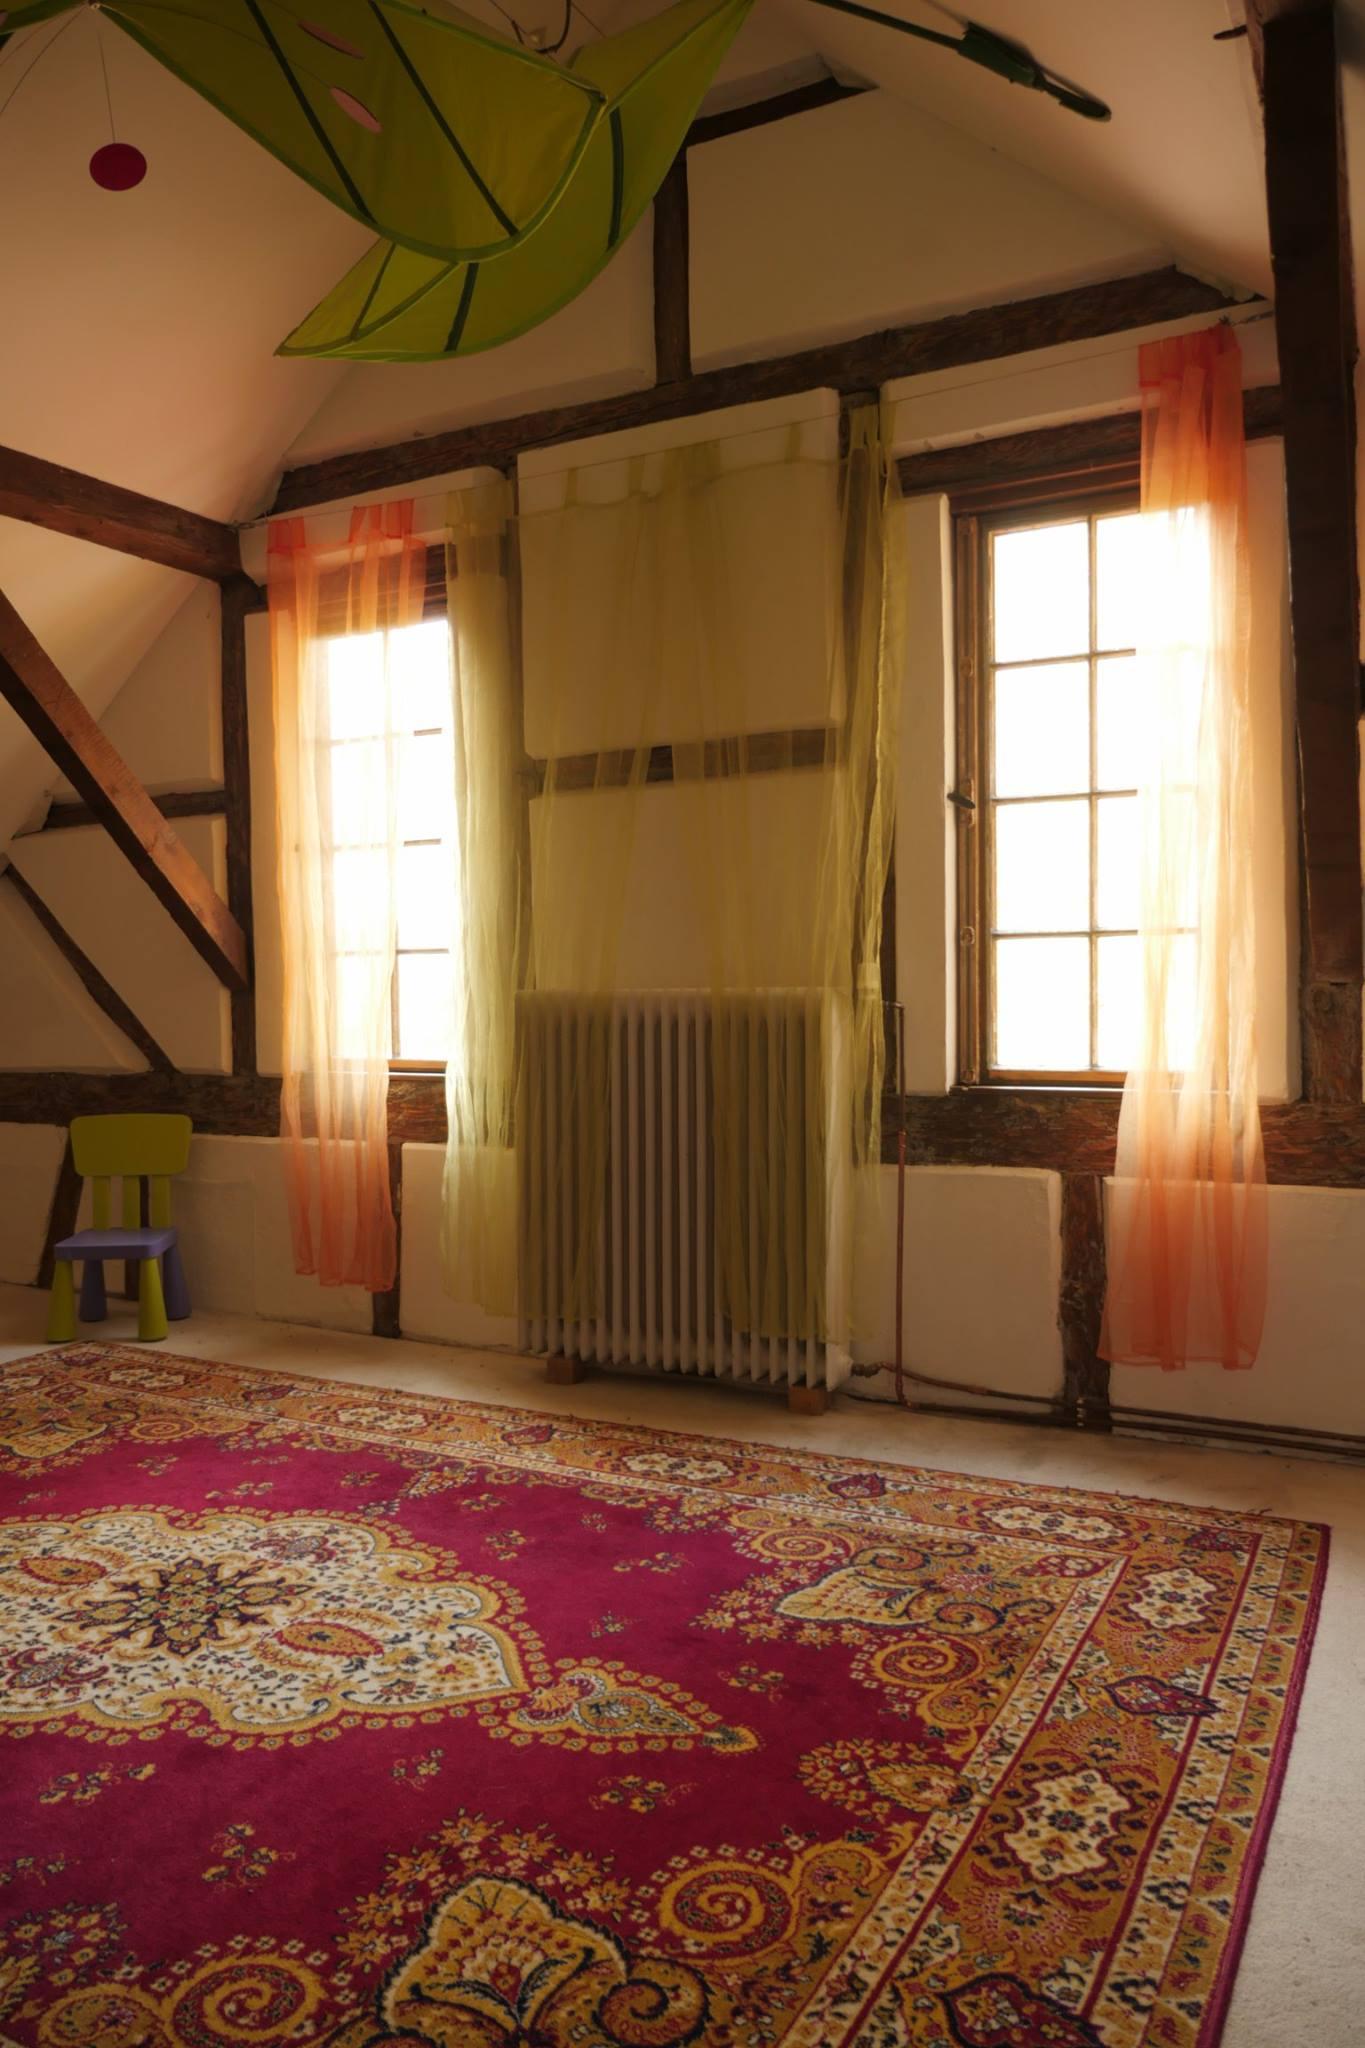 57_Zimmer03_Gesindehaus_A